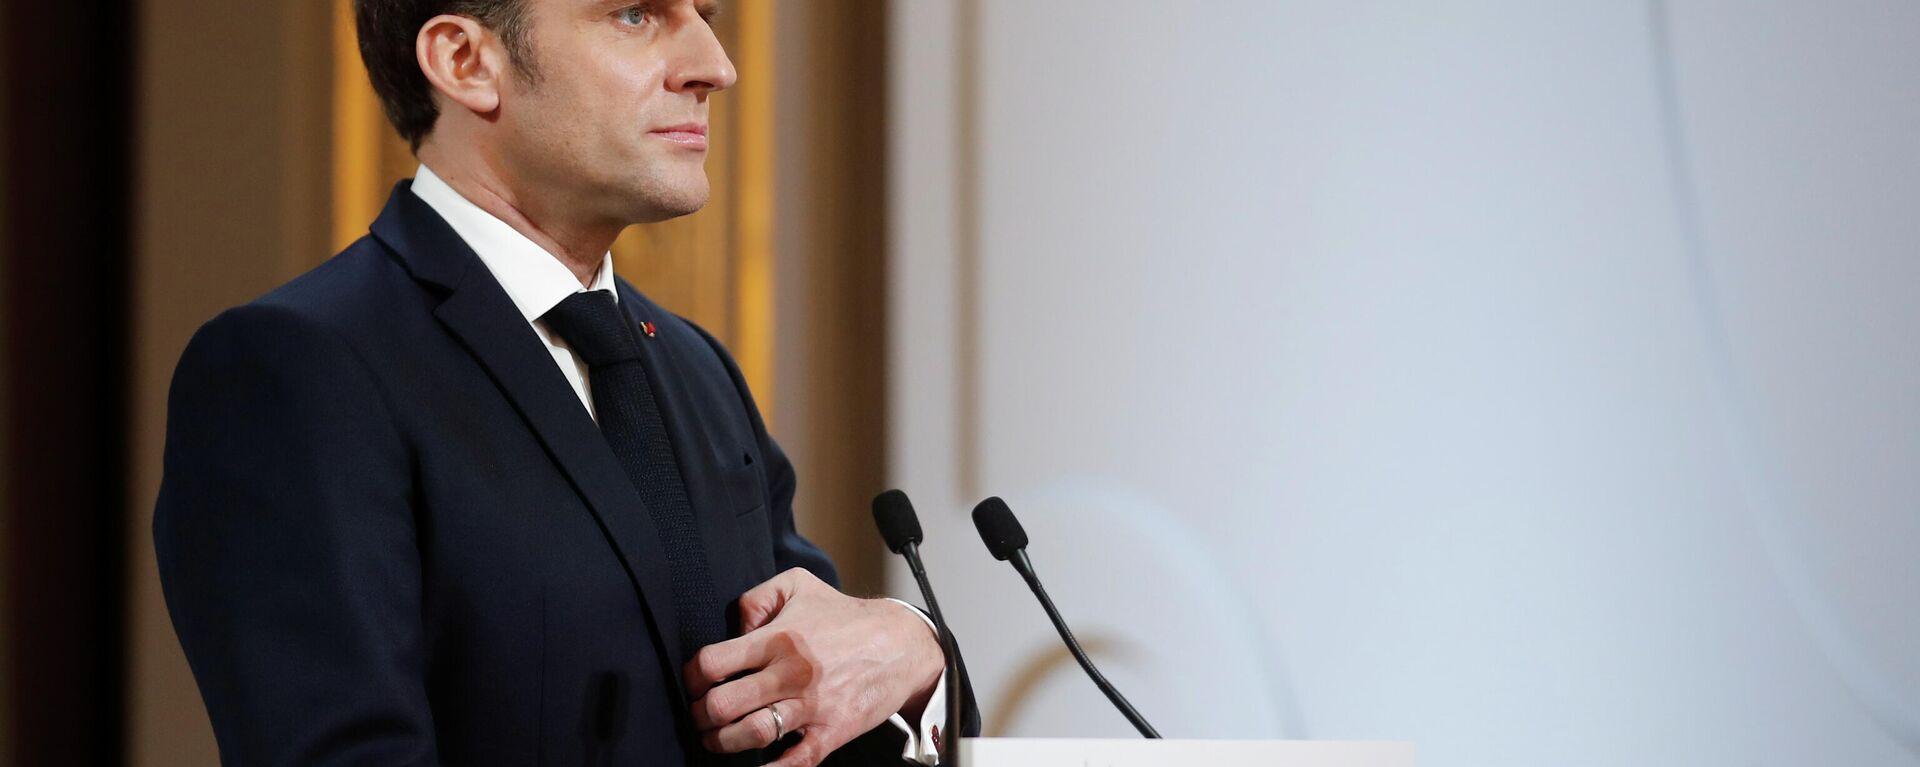 Emmanuel Macron, presidente de Francia - Sputnik Mundo, 1920, 21.02.2021